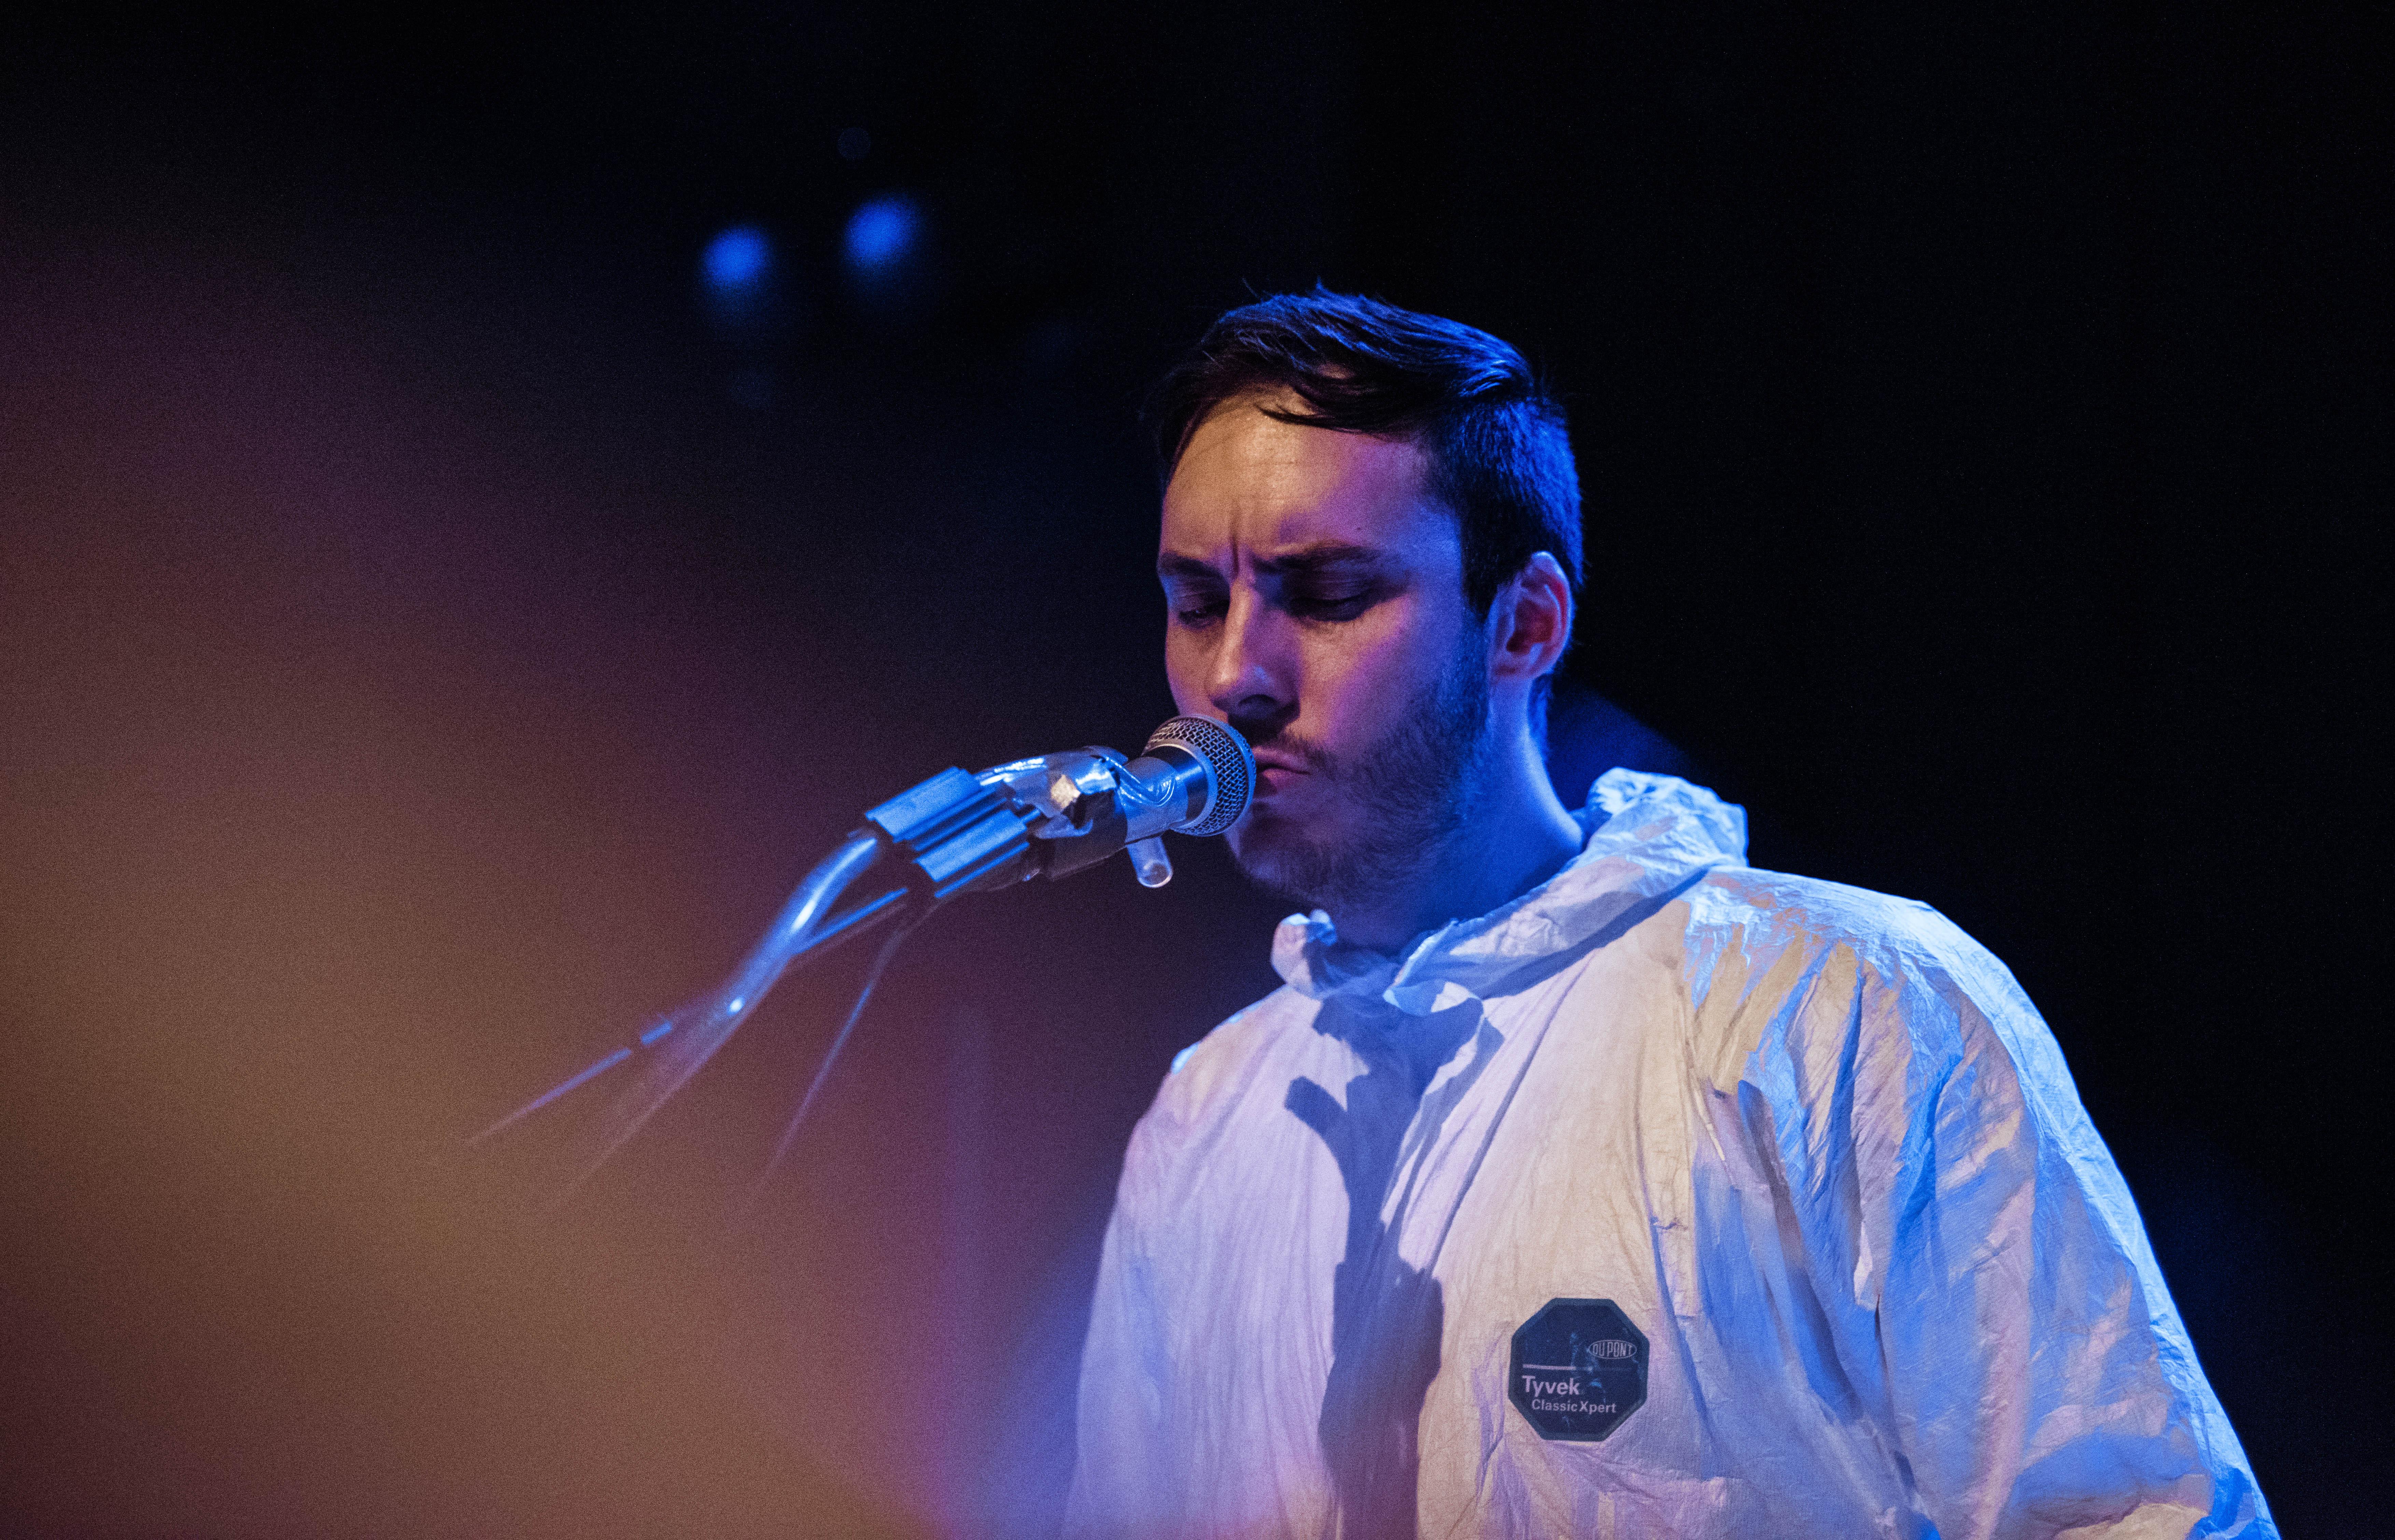 boo seeka music live review sydney artist resin moon photo credit dominique burns blackwell savage thrills savagethrills